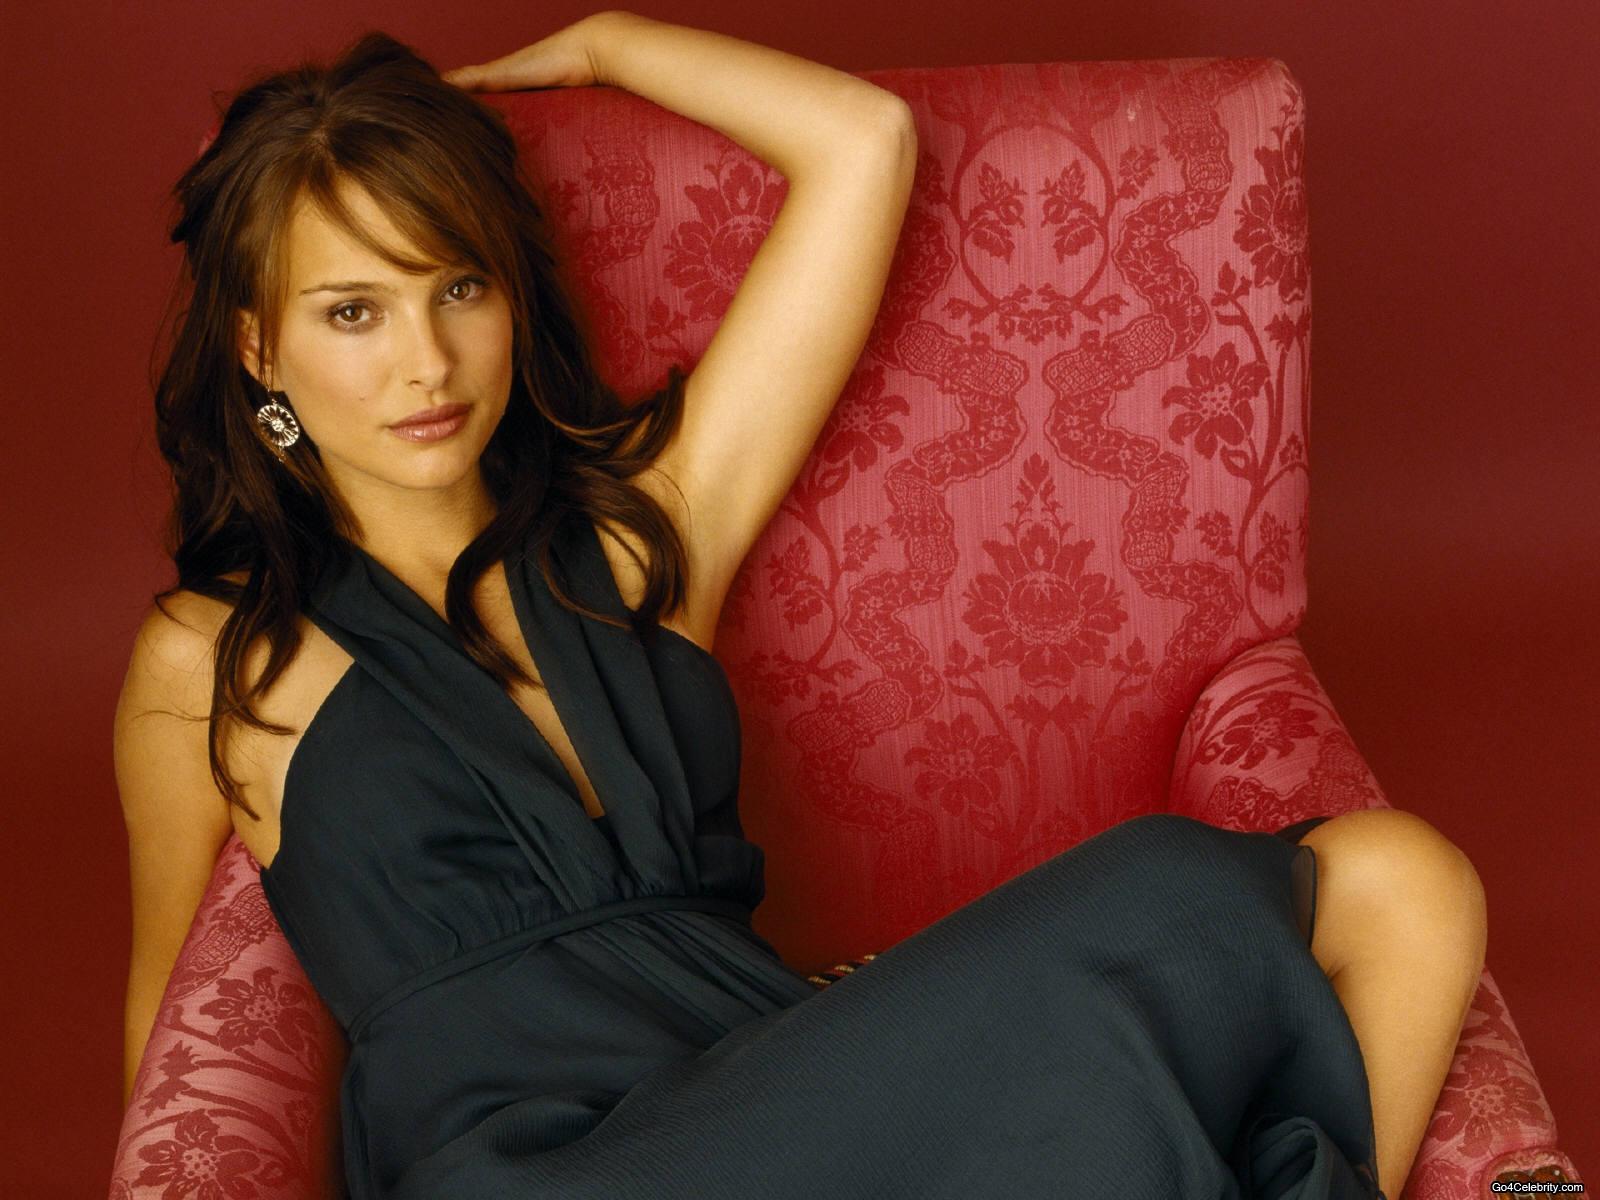 Natalie Portman: Natalie Portman Hot Wallpapers Kiss Tumblr Black And ... Q Dope Coating